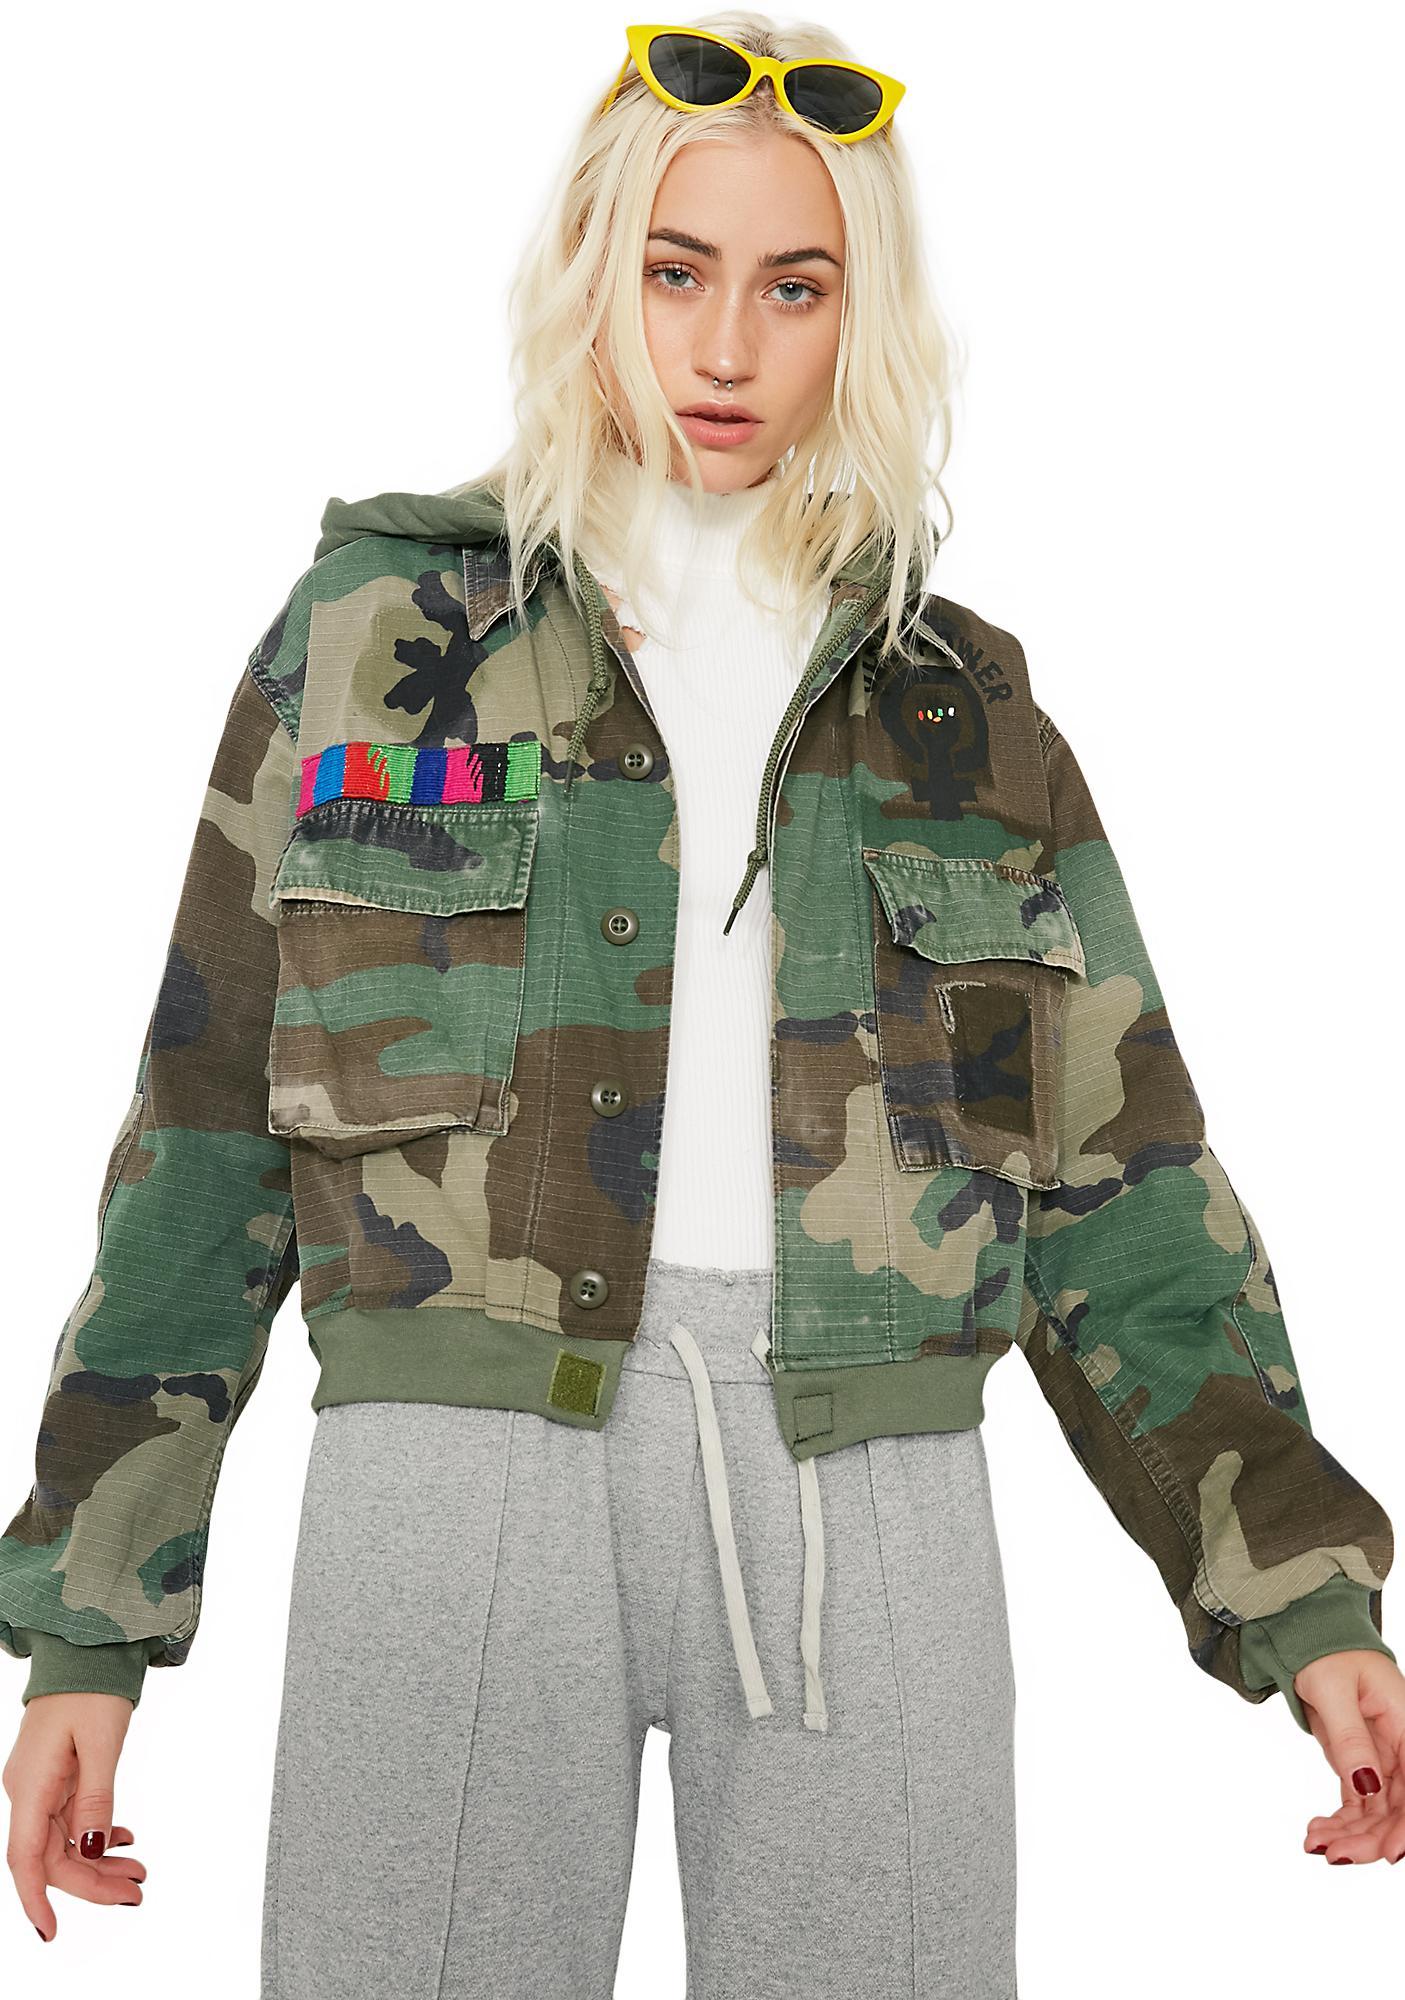 Cross Colours Girl Power M65 Jacket